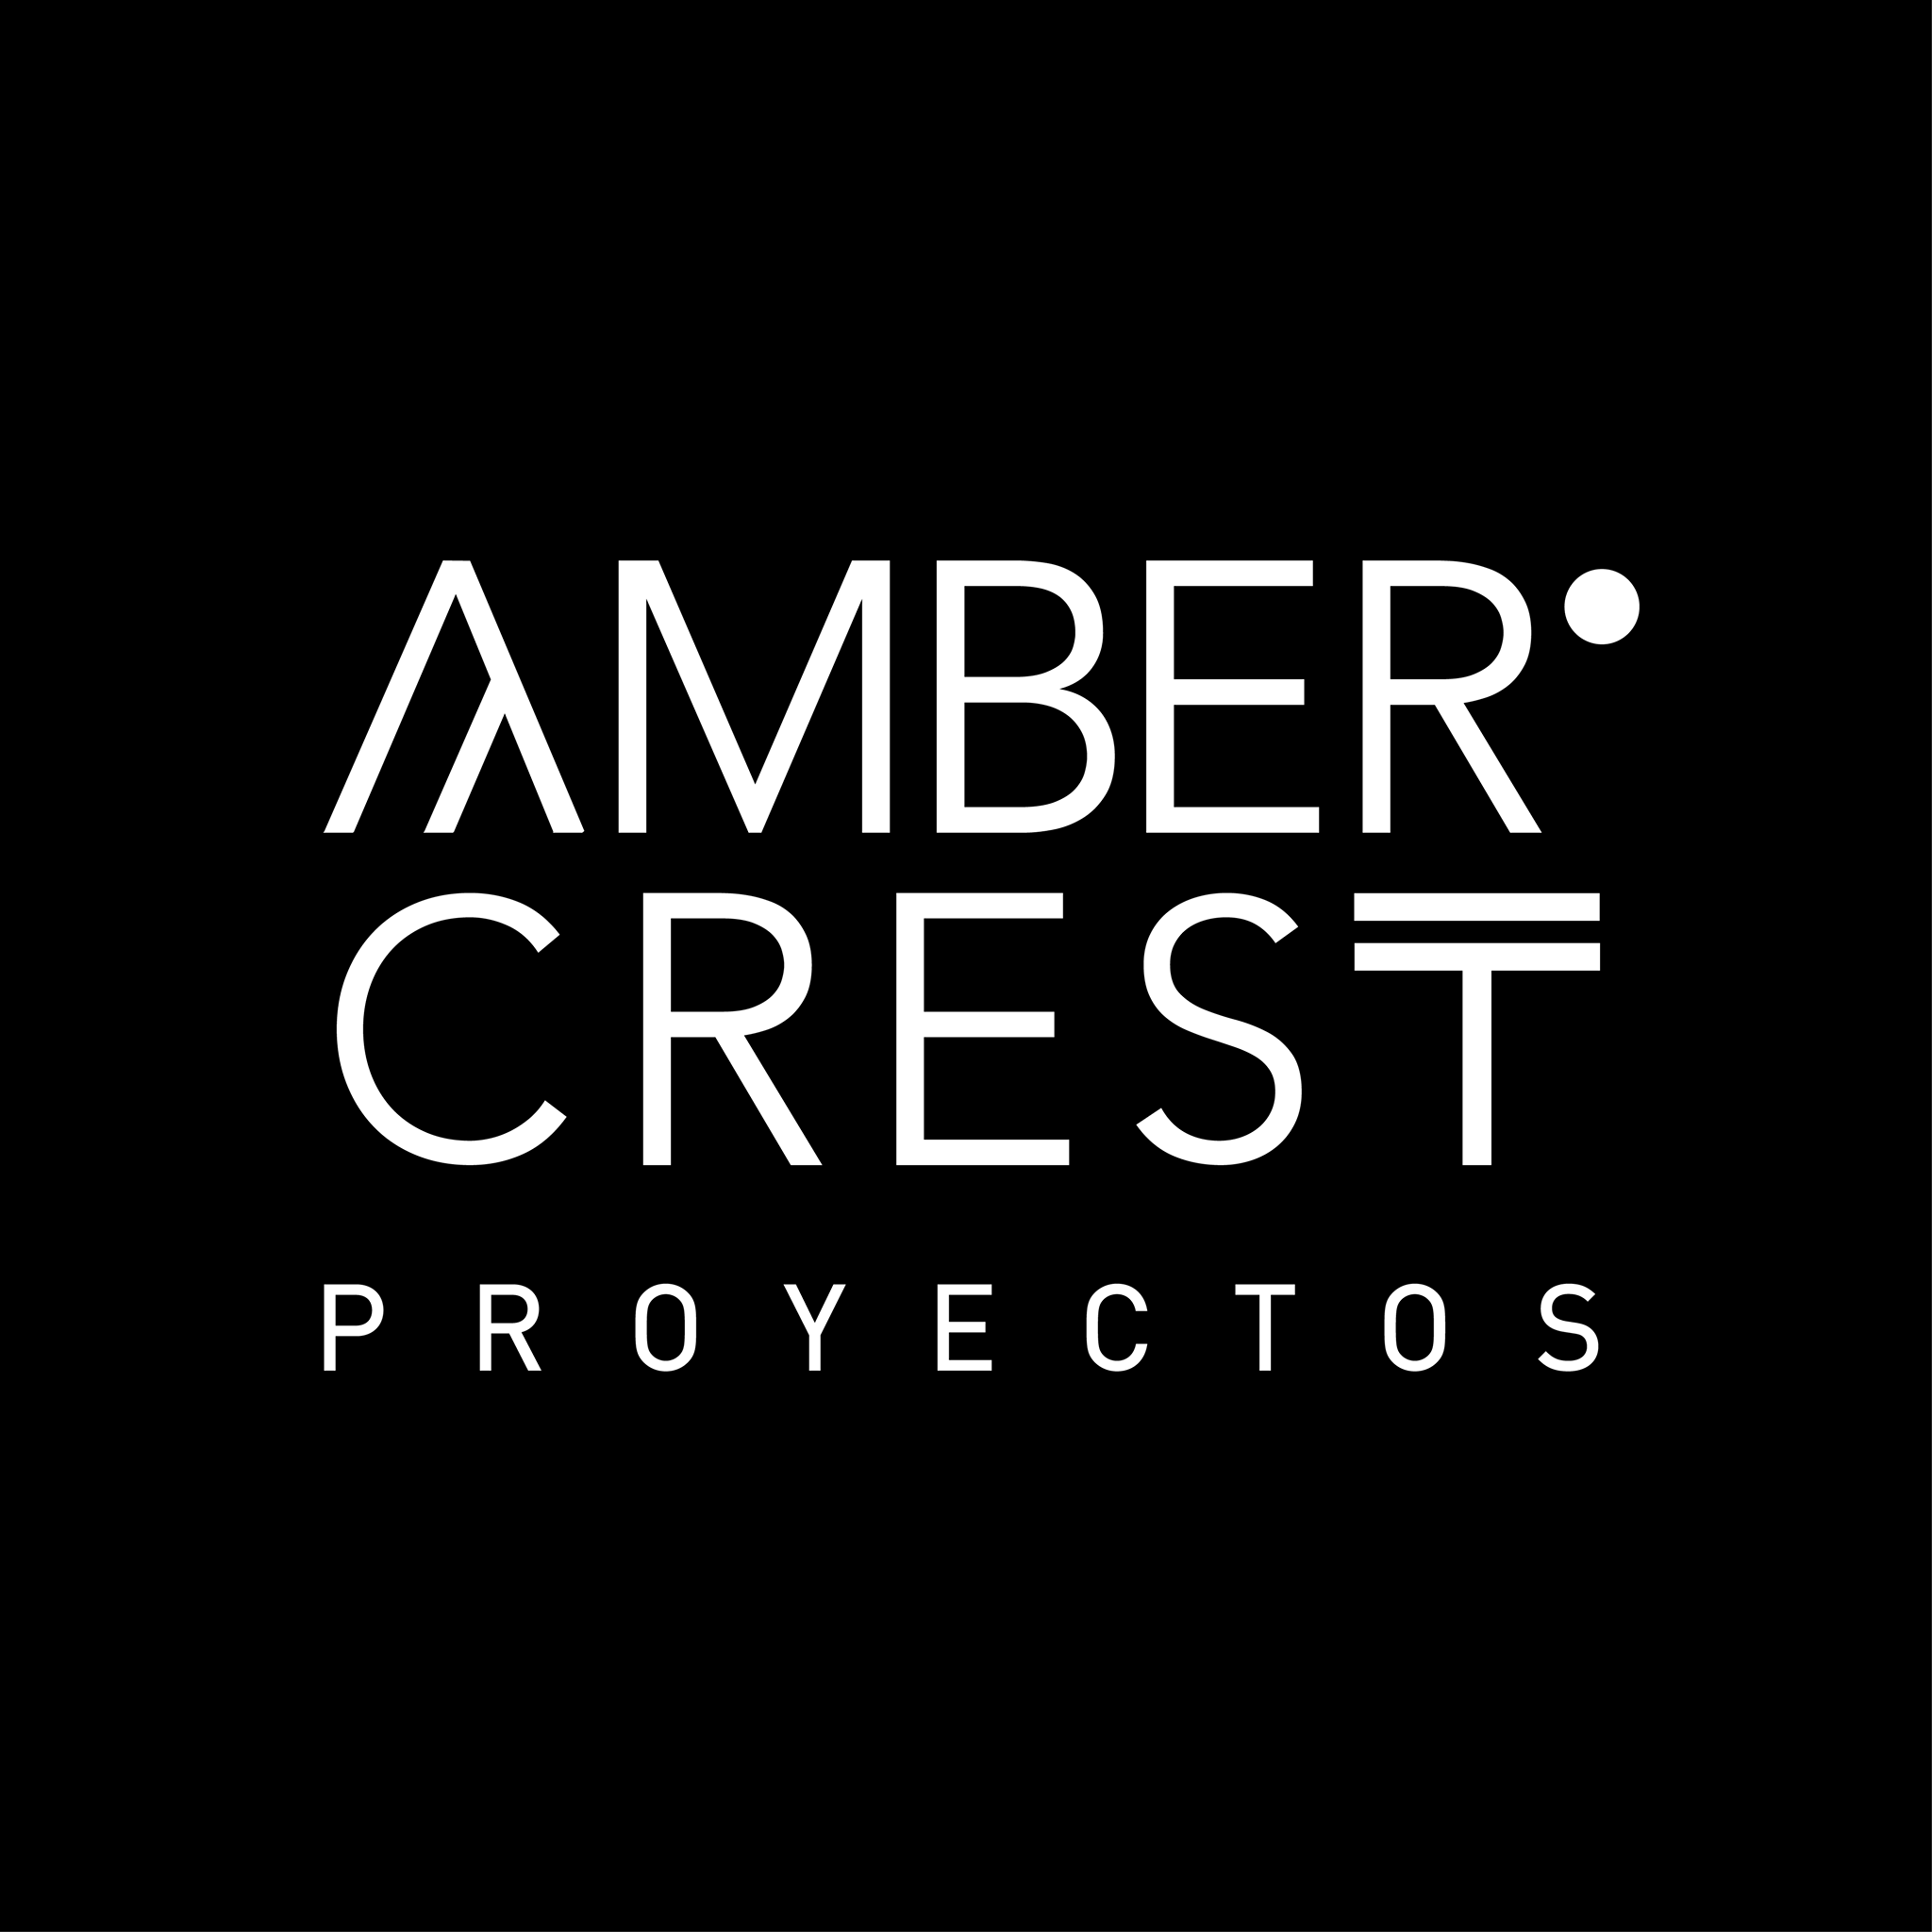 Ambercrest